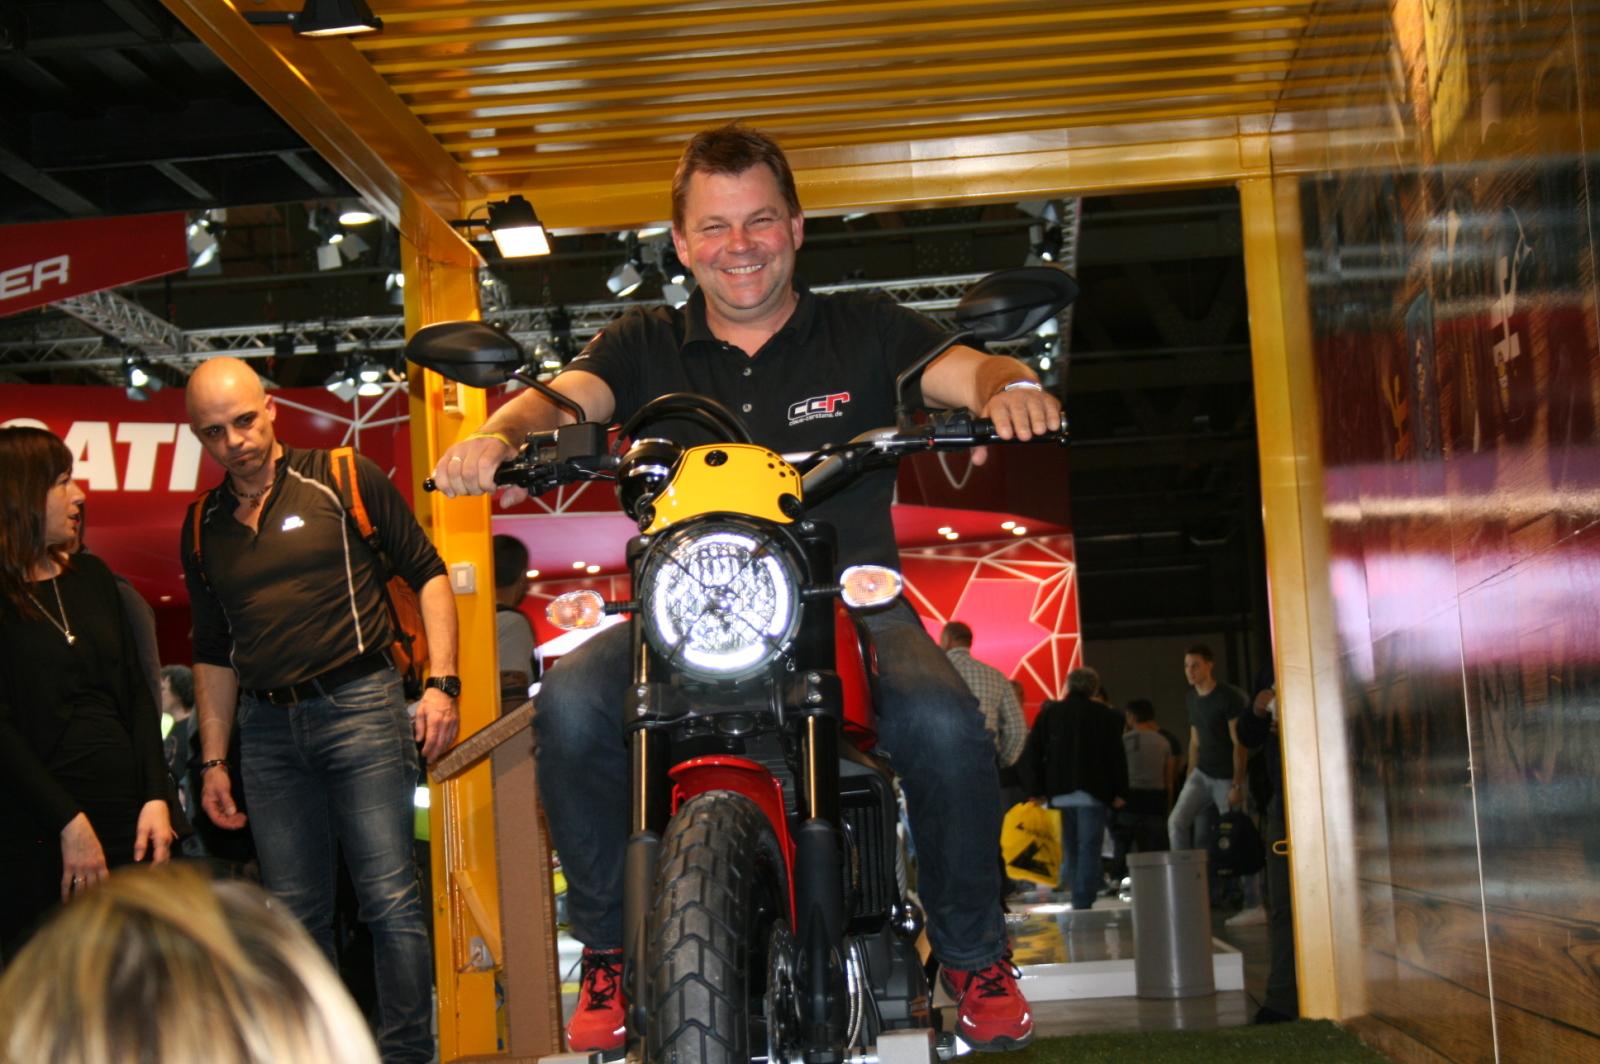 Ducati Scrambler live in Hennstedt 29.11.